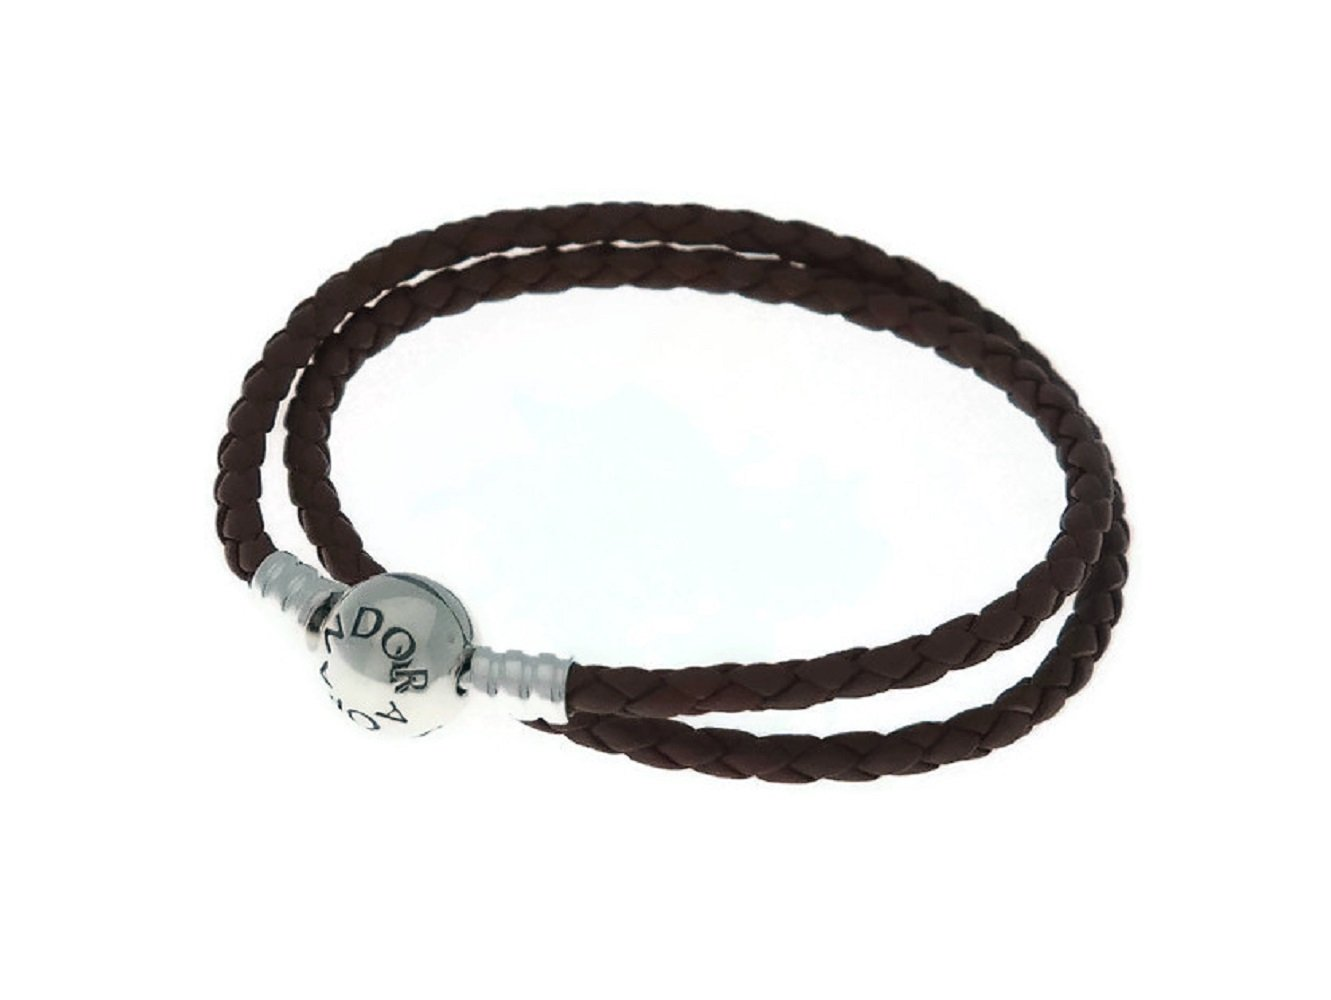 PANDORA Brown Braided-Double Leather Charm Bracelet, 590745CBN (15)